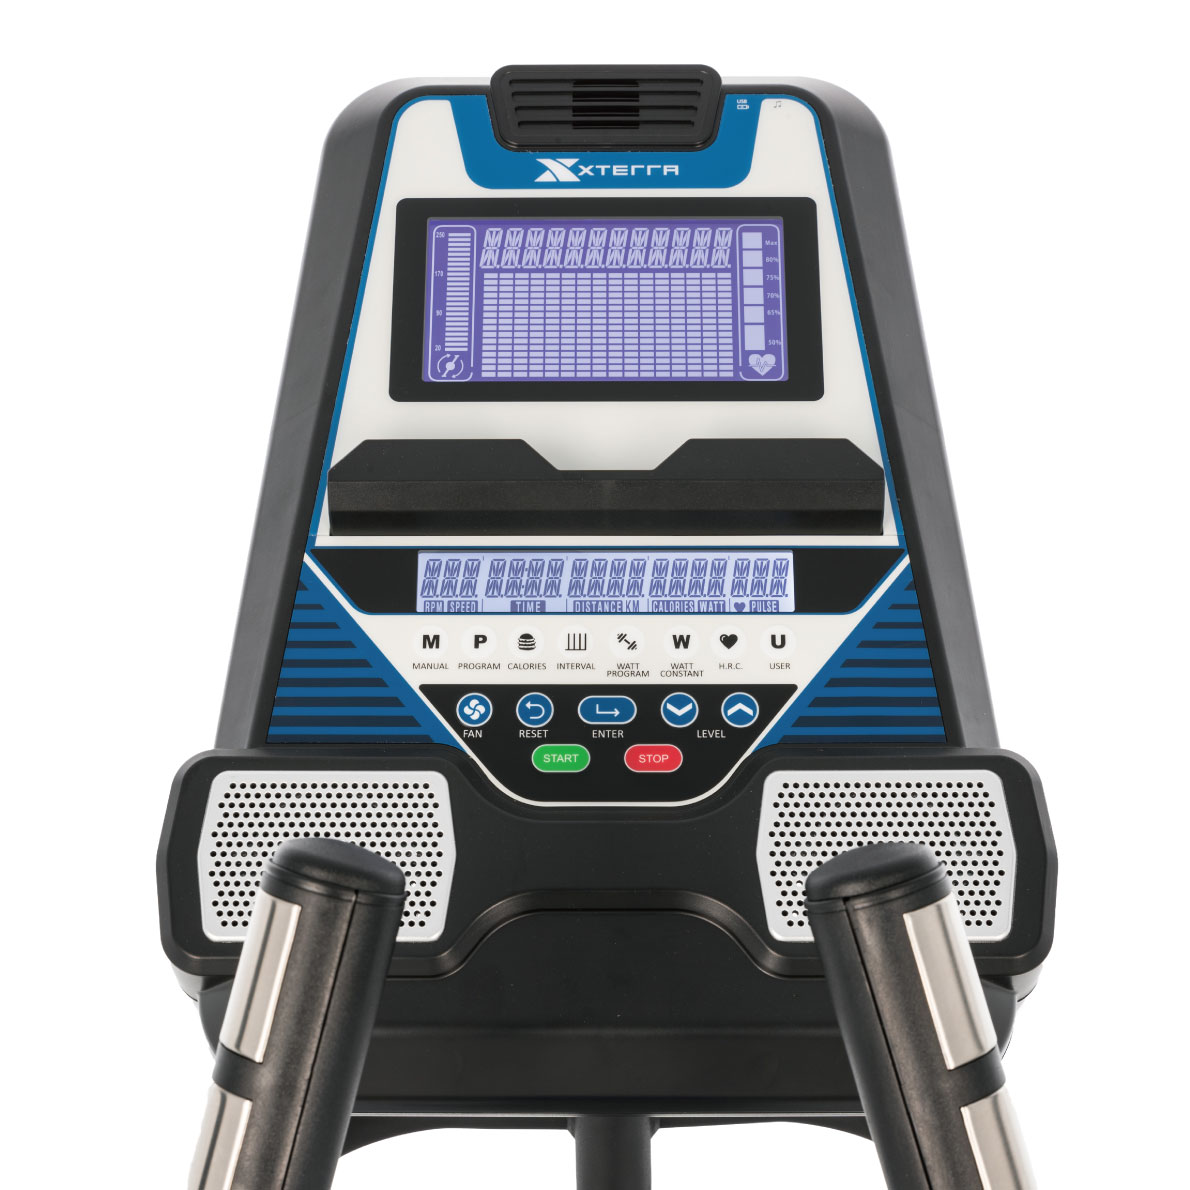 FSX1500/家庭用クロストレーナー(エリプティカルトレーナー)《DYACO(ダイヤコ)》